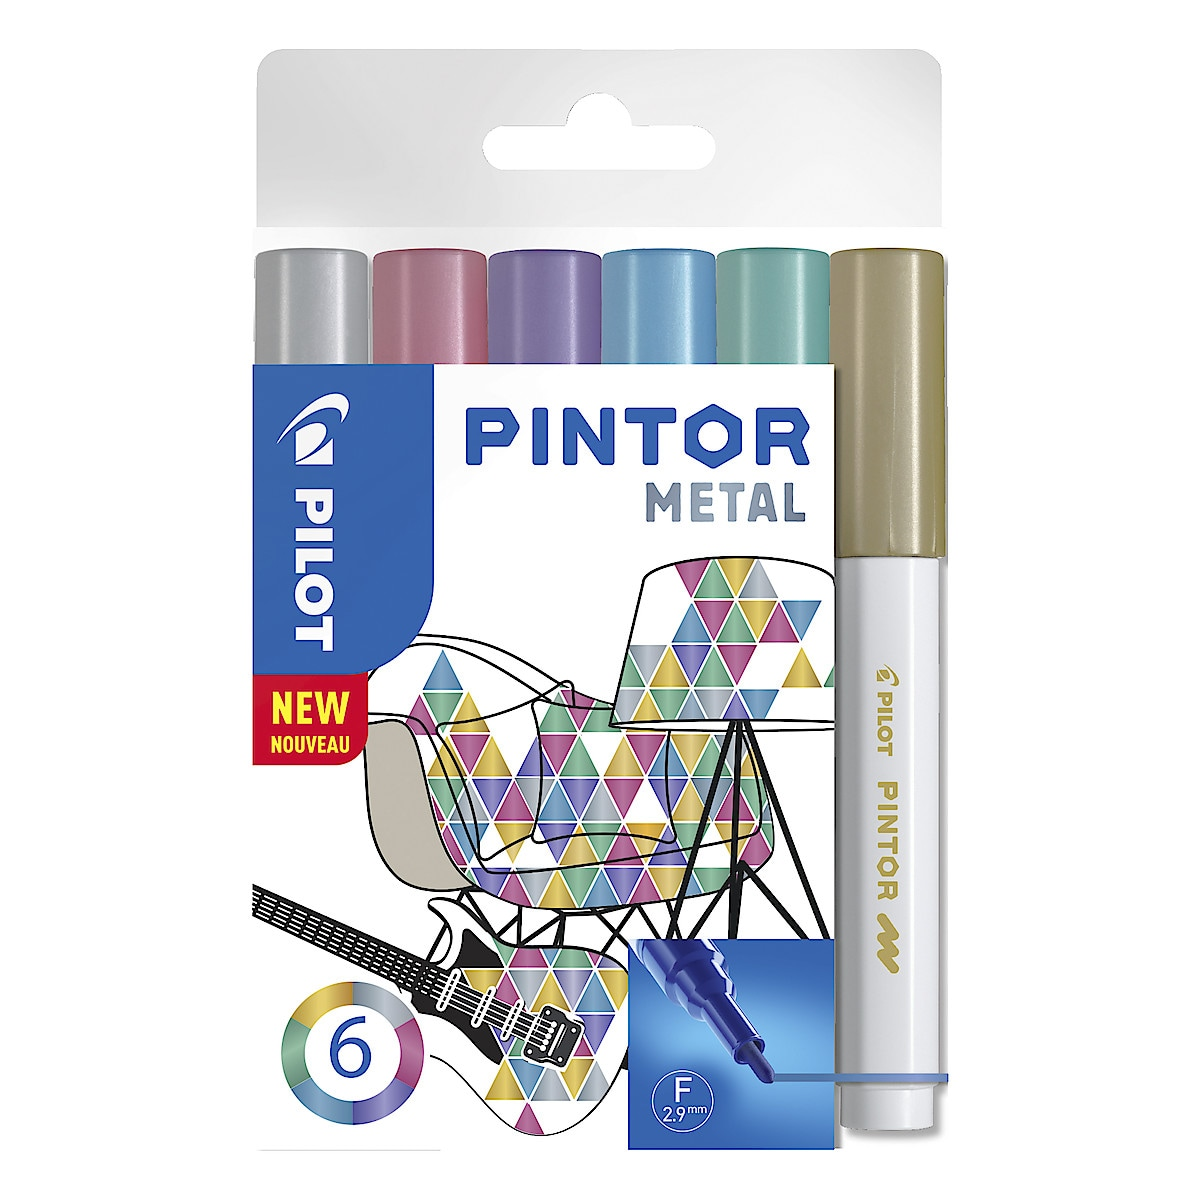 Set of 6 Pilot Pintor Marker Pens – Metallic